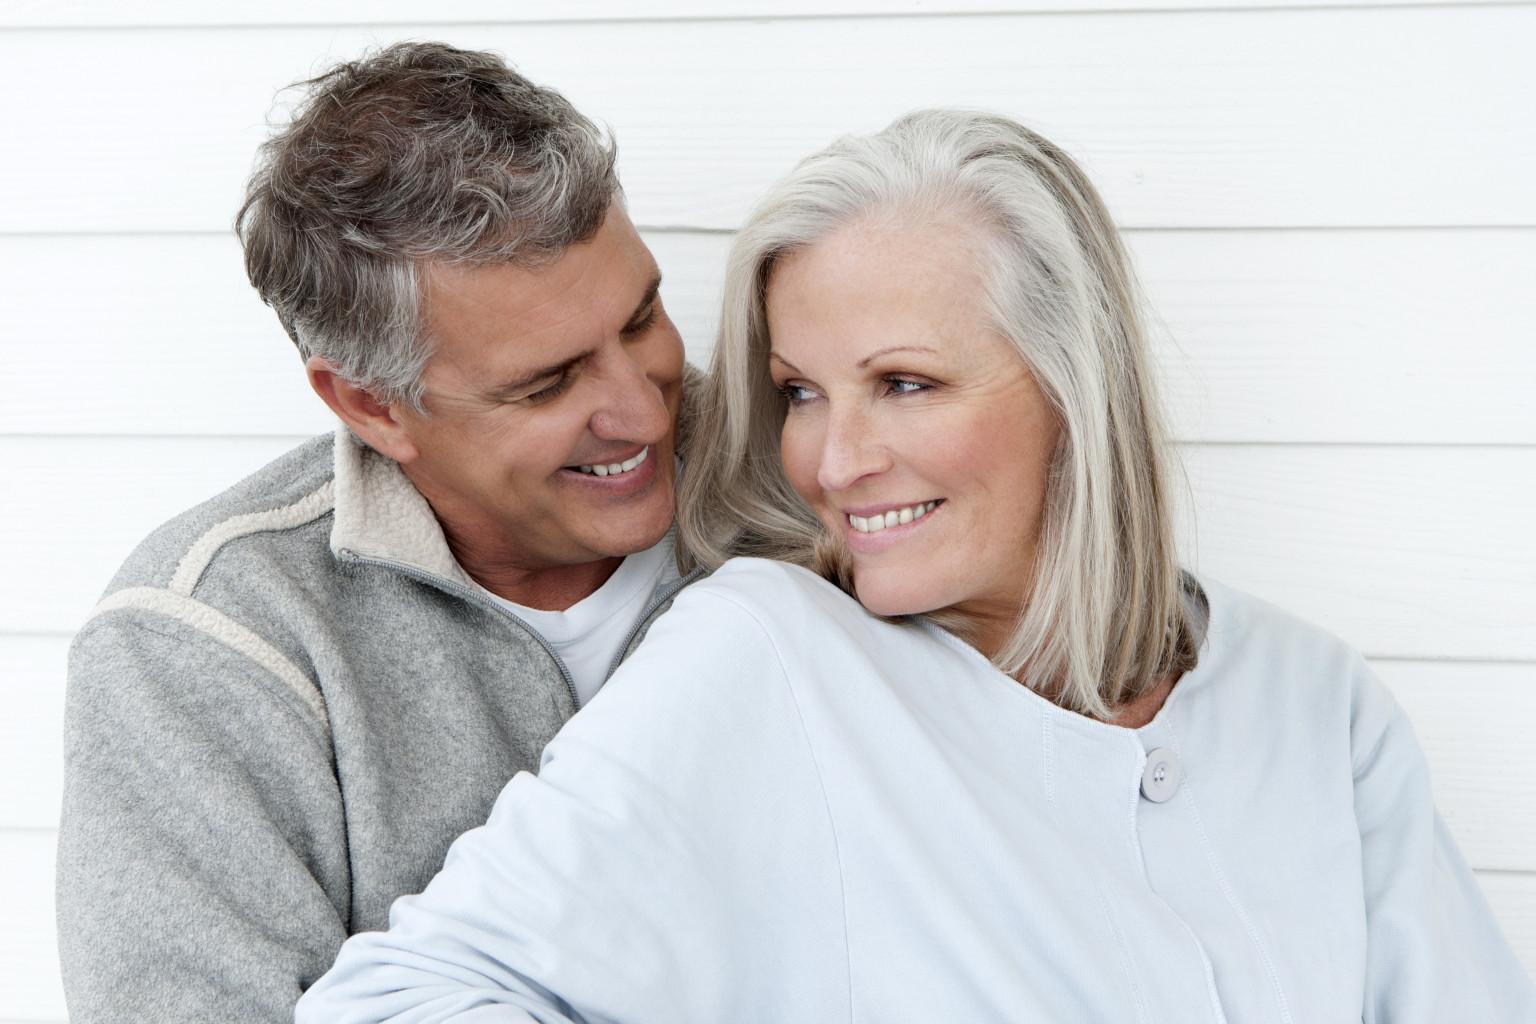 Cialis and Viagra reviews, free trial